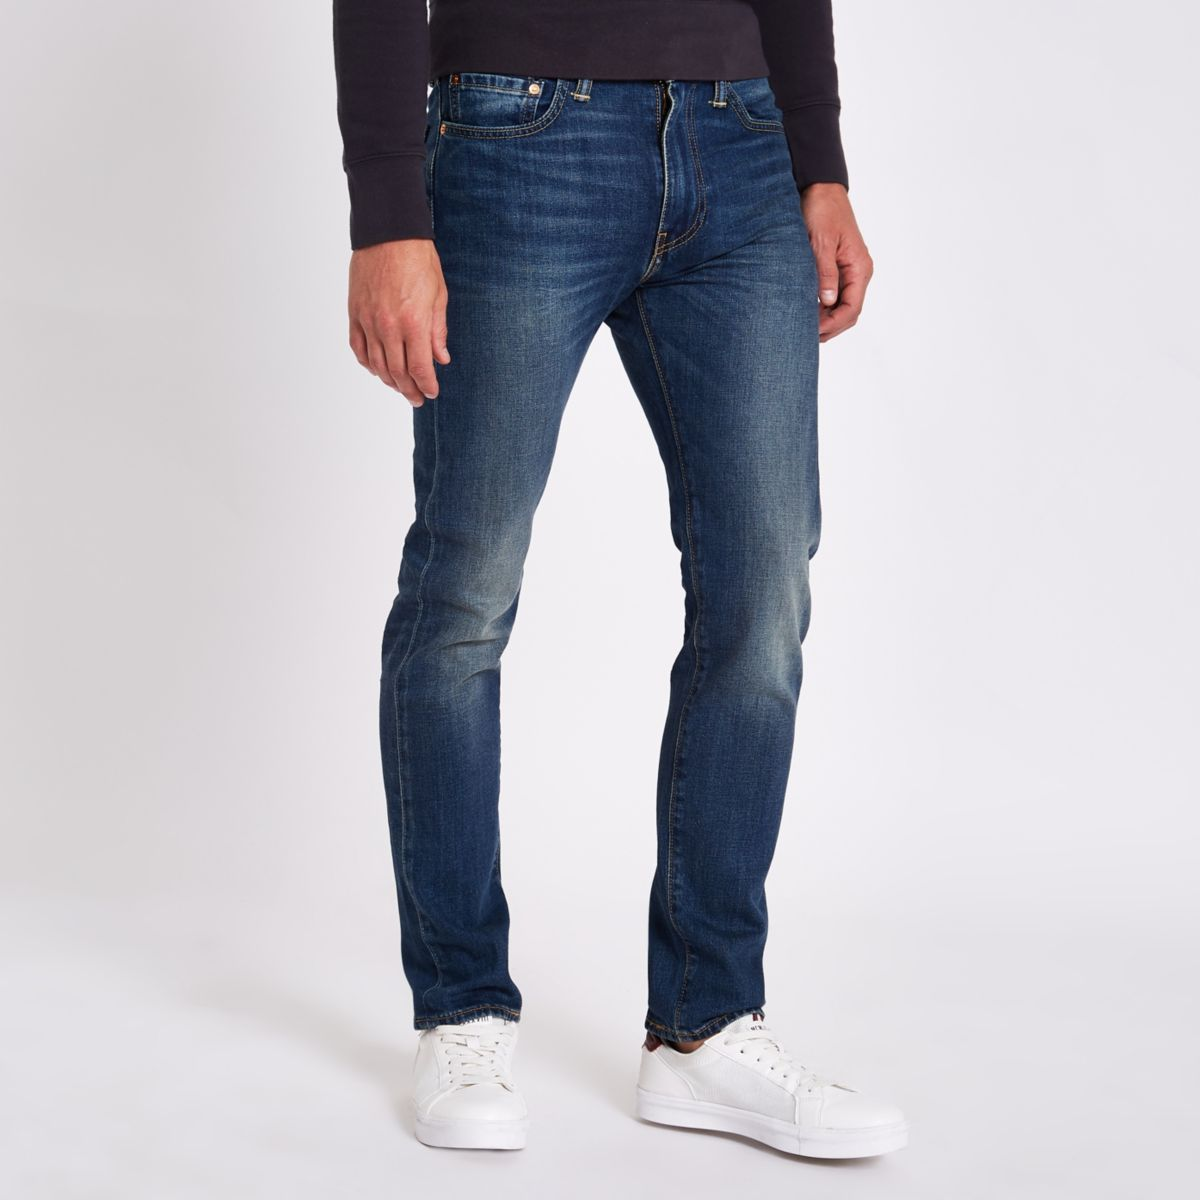 Levi's dark blue 510 skinny fit jeans